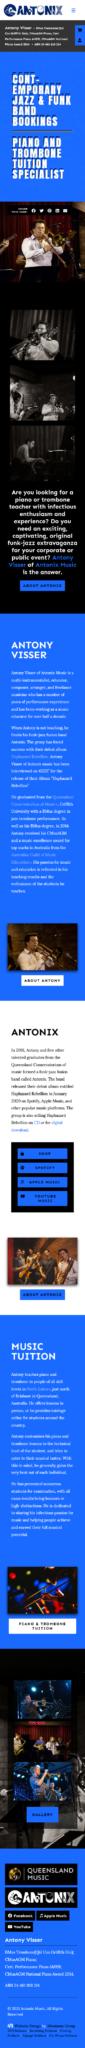 Antonix Music: Mobile View